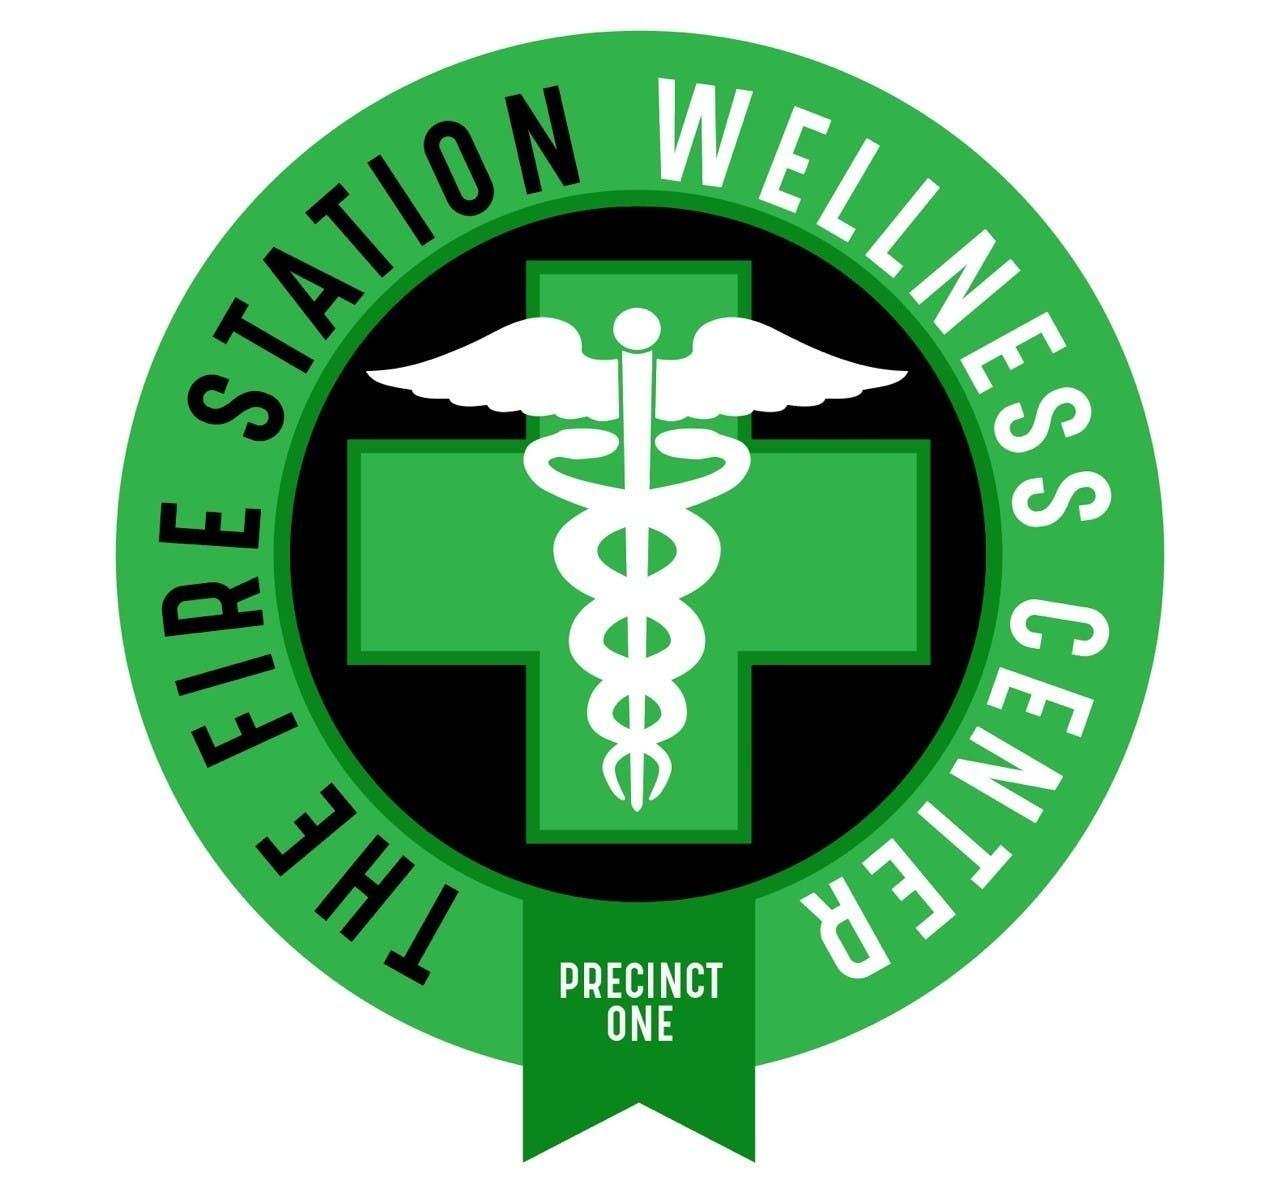 The Fire Station Wellness Center | Store